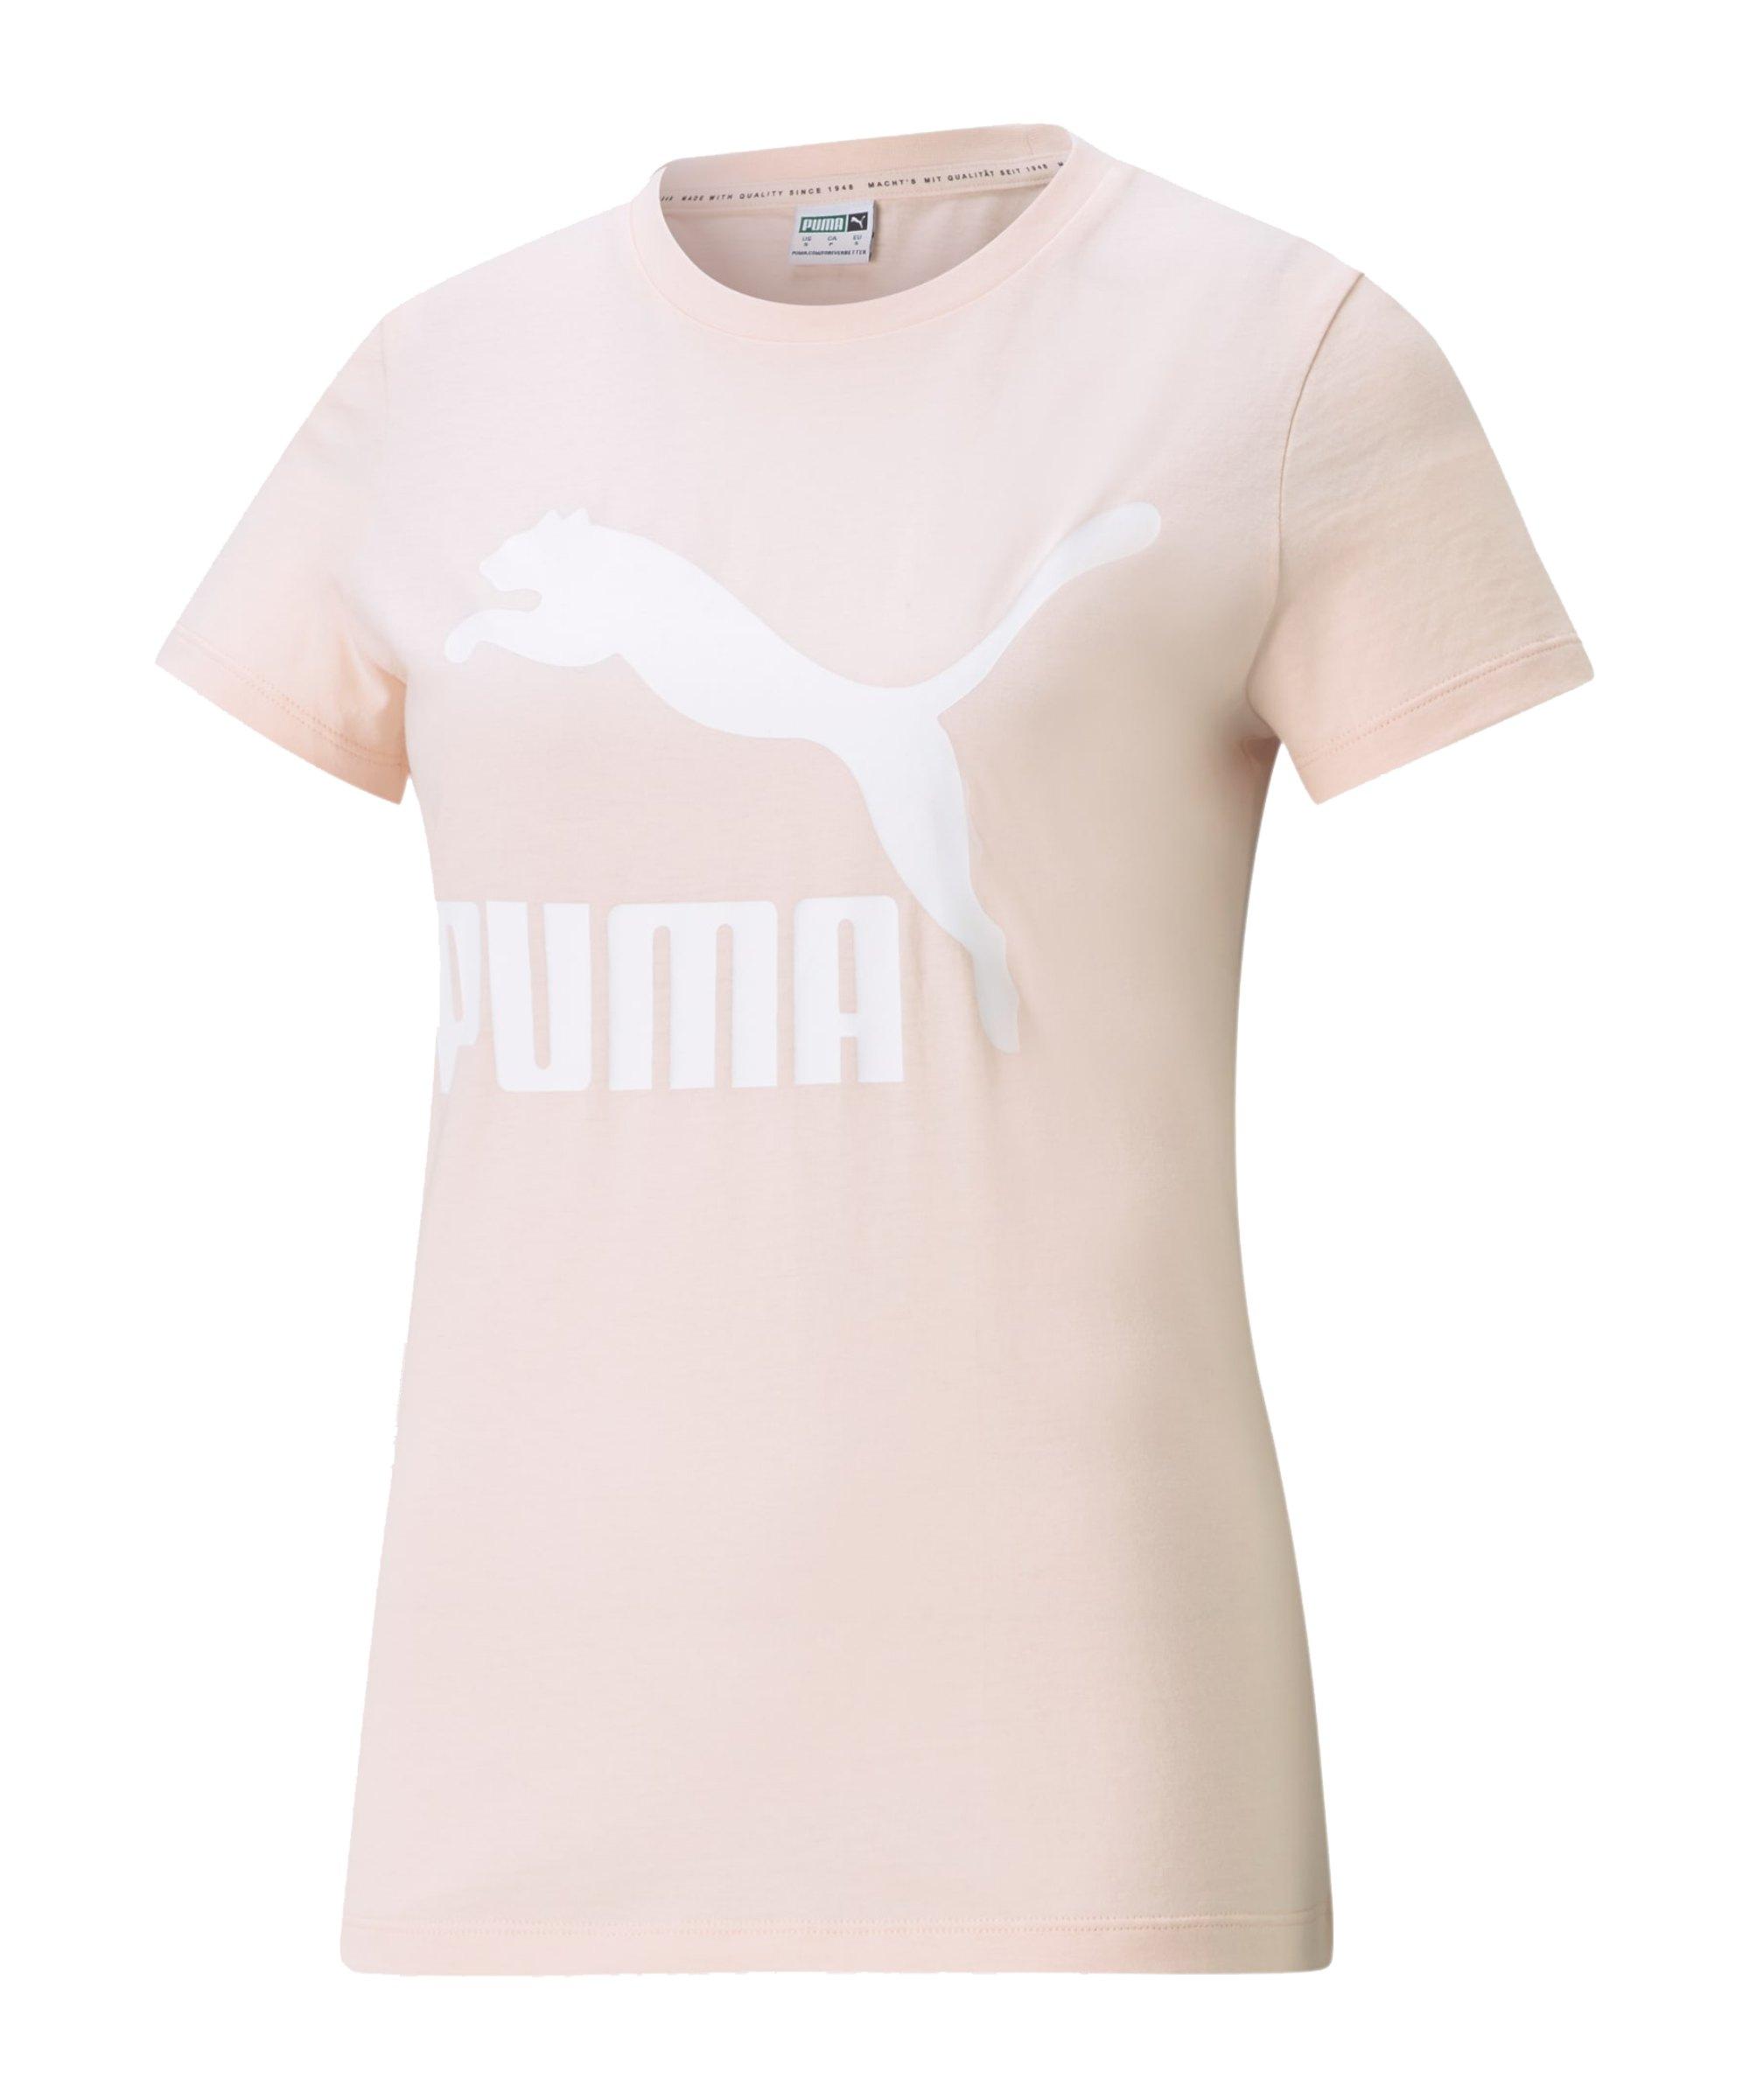 PUMA Classic Logo T-Shirt Damen Pink F27 - pink